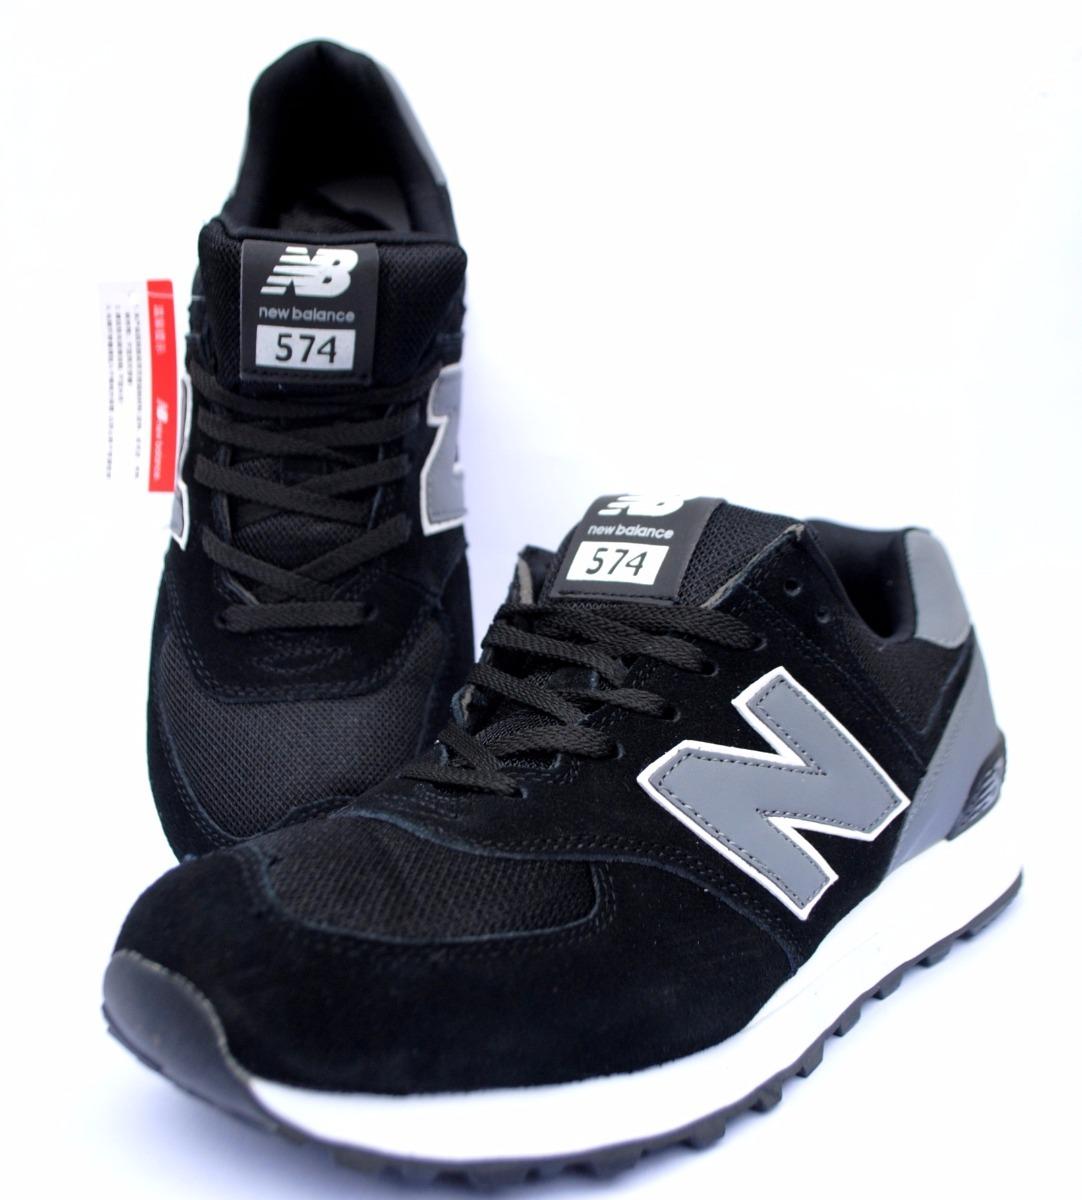 new balance negras 574 hombre